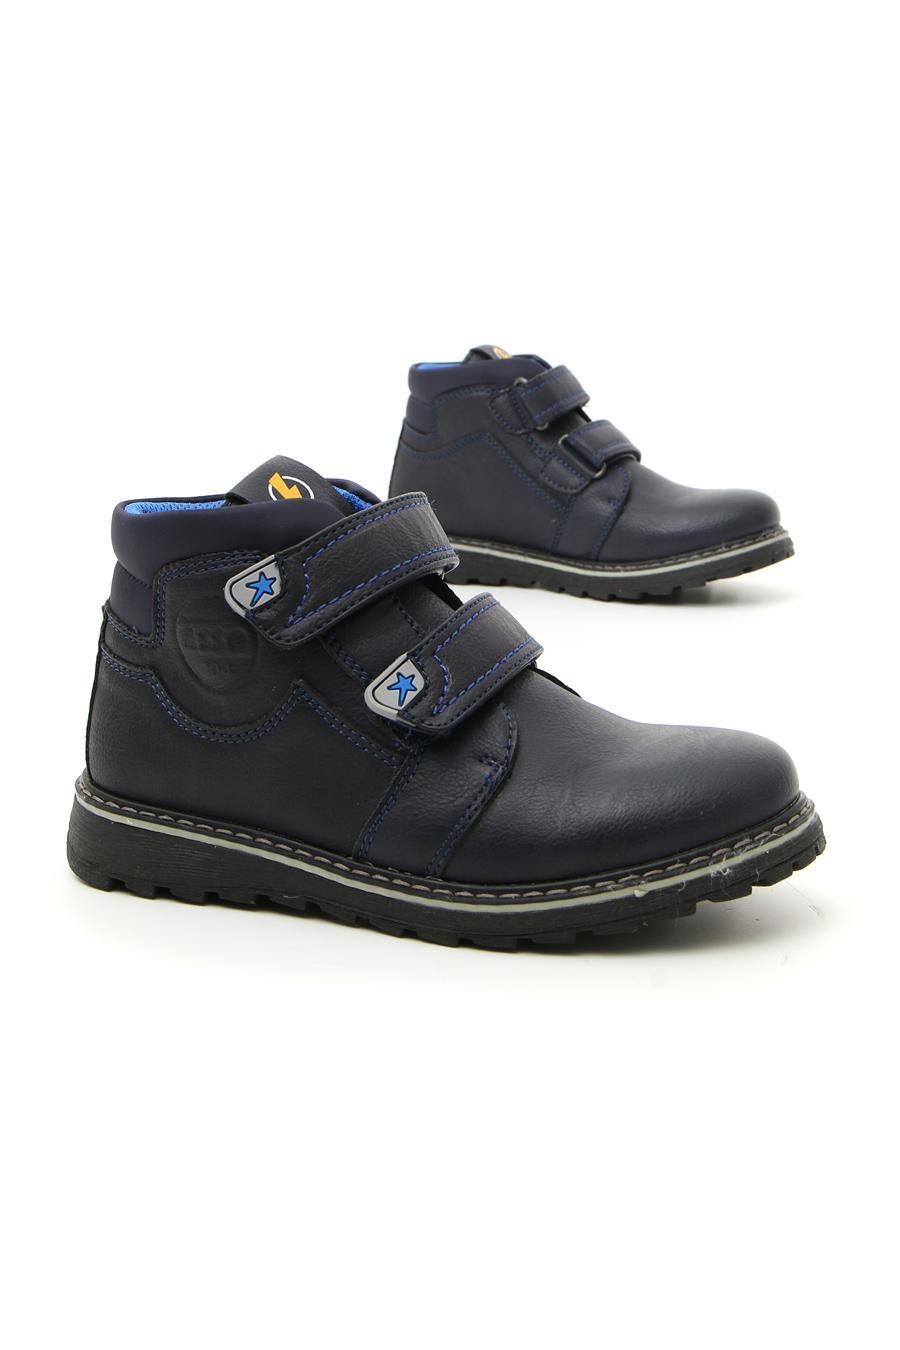 SNEAKERS ASSO 686052 bambino blu | Pittarello